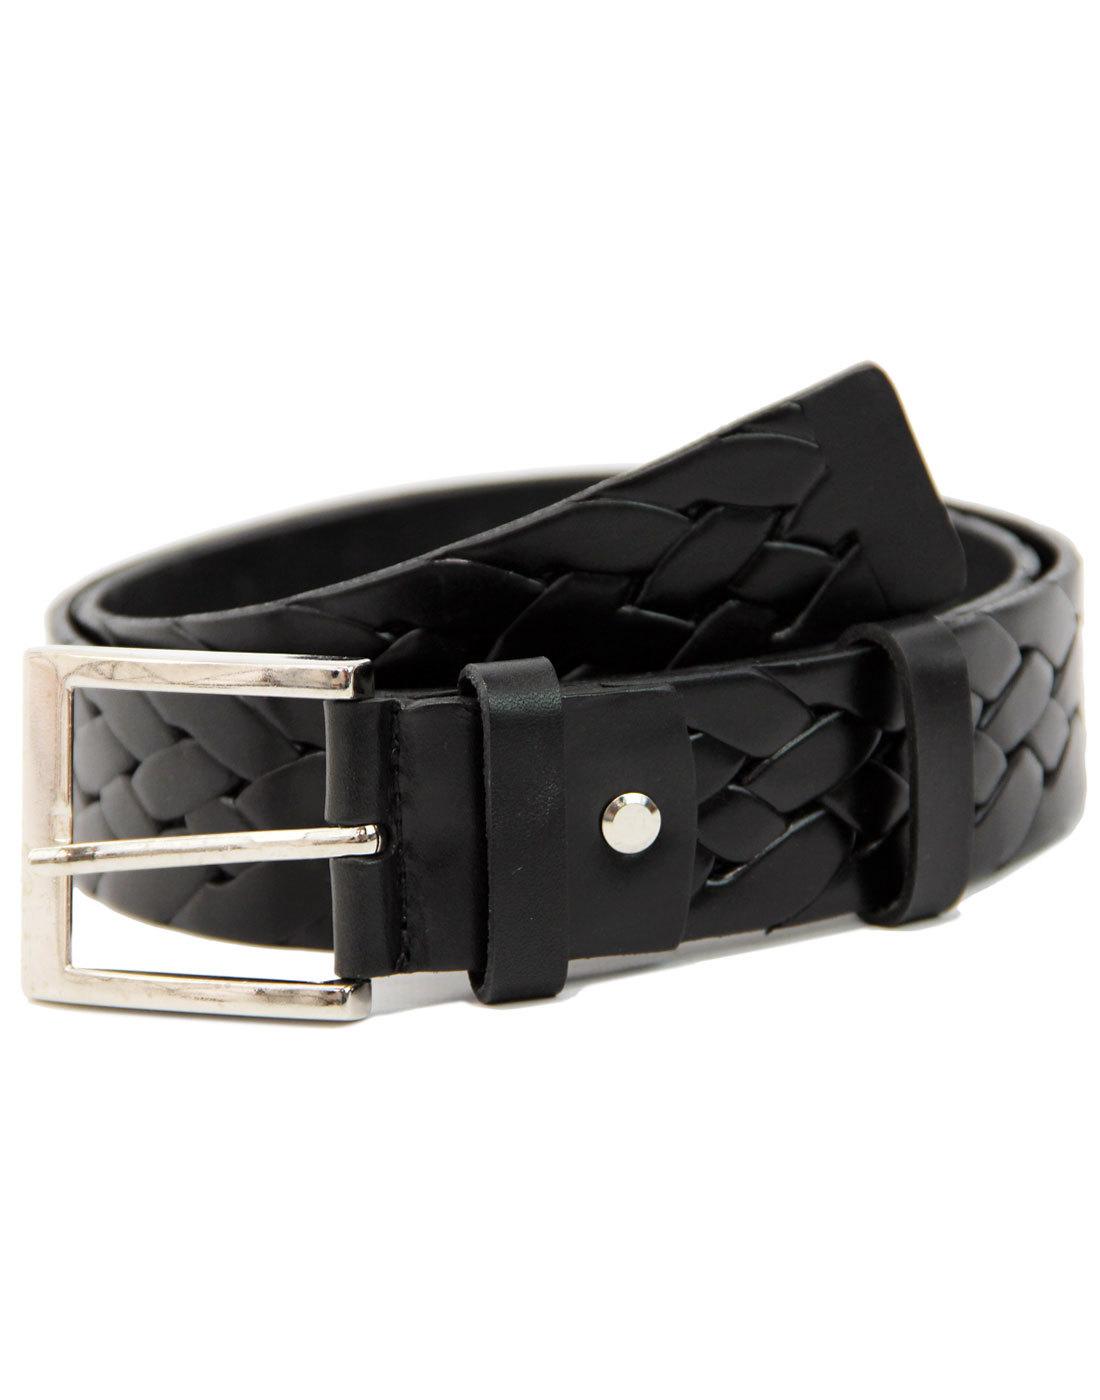 LACUZZO Retro Mod Woven Stamp Leather Belt BLACK